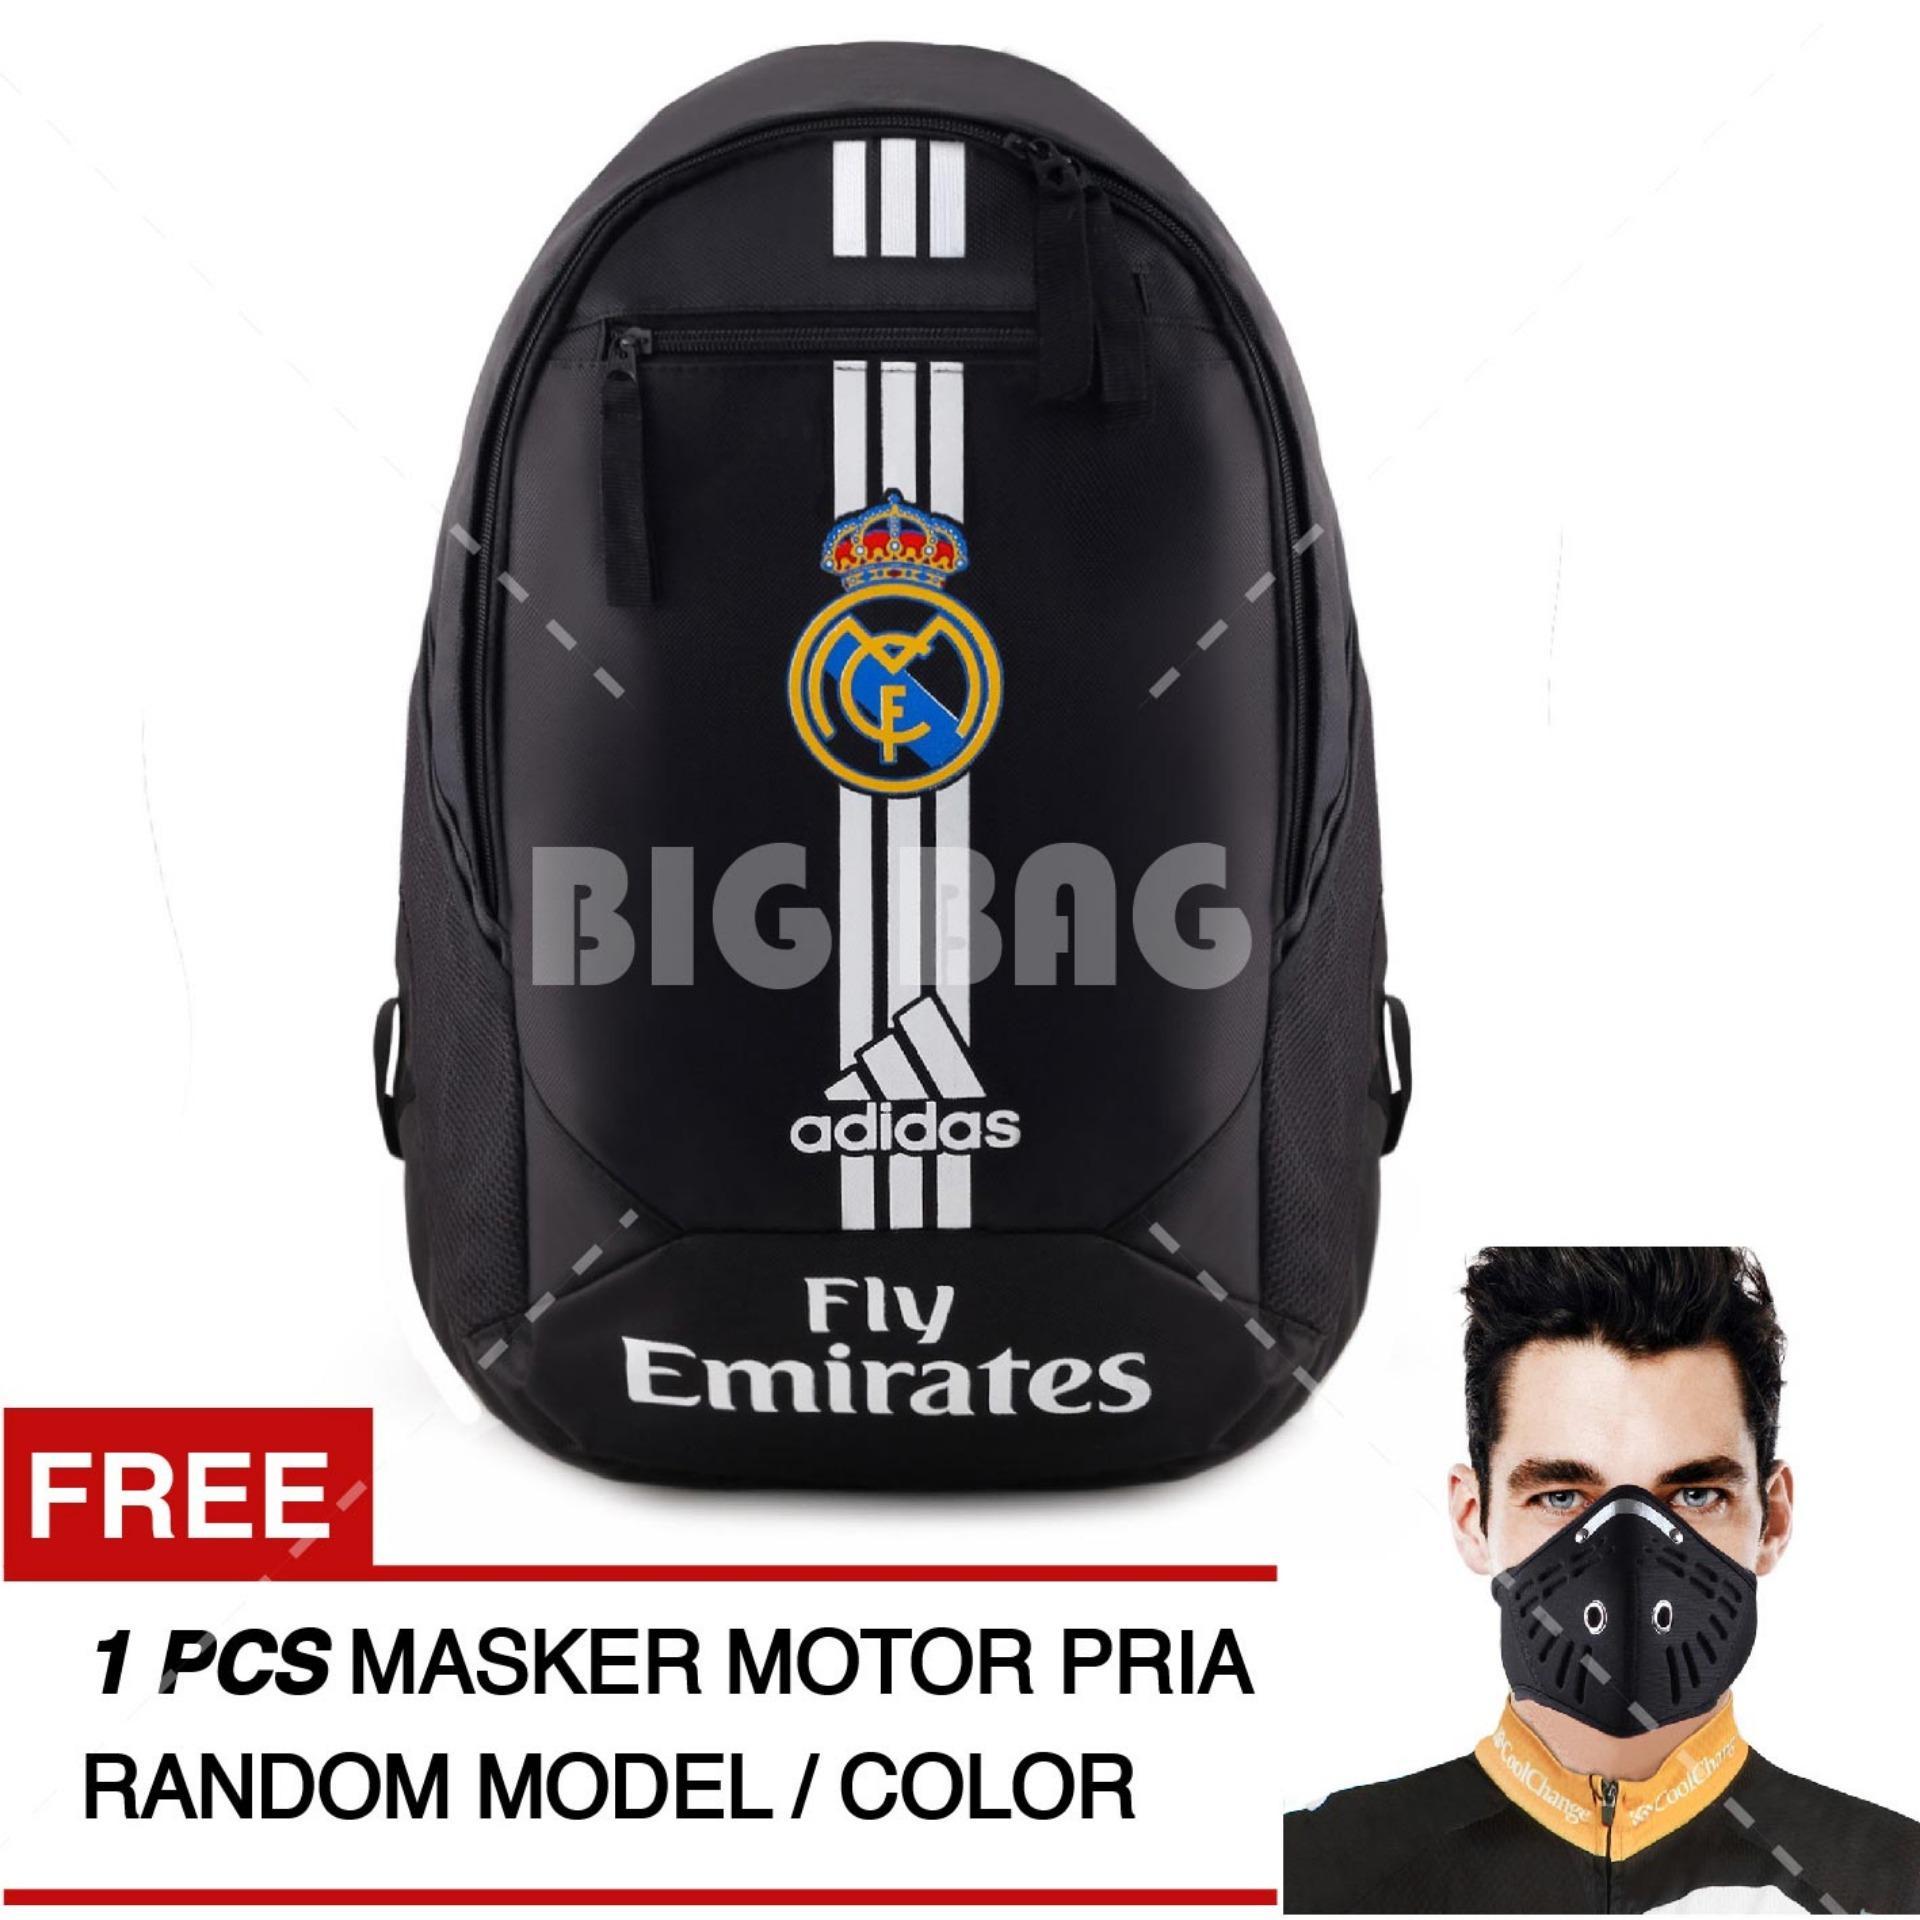 Tas Ransel Adidas Bola Pria Real Madrid C.F Laptop Backpack Men Soccer Editions - Black + Raincover + FREE Masker Motor Pria